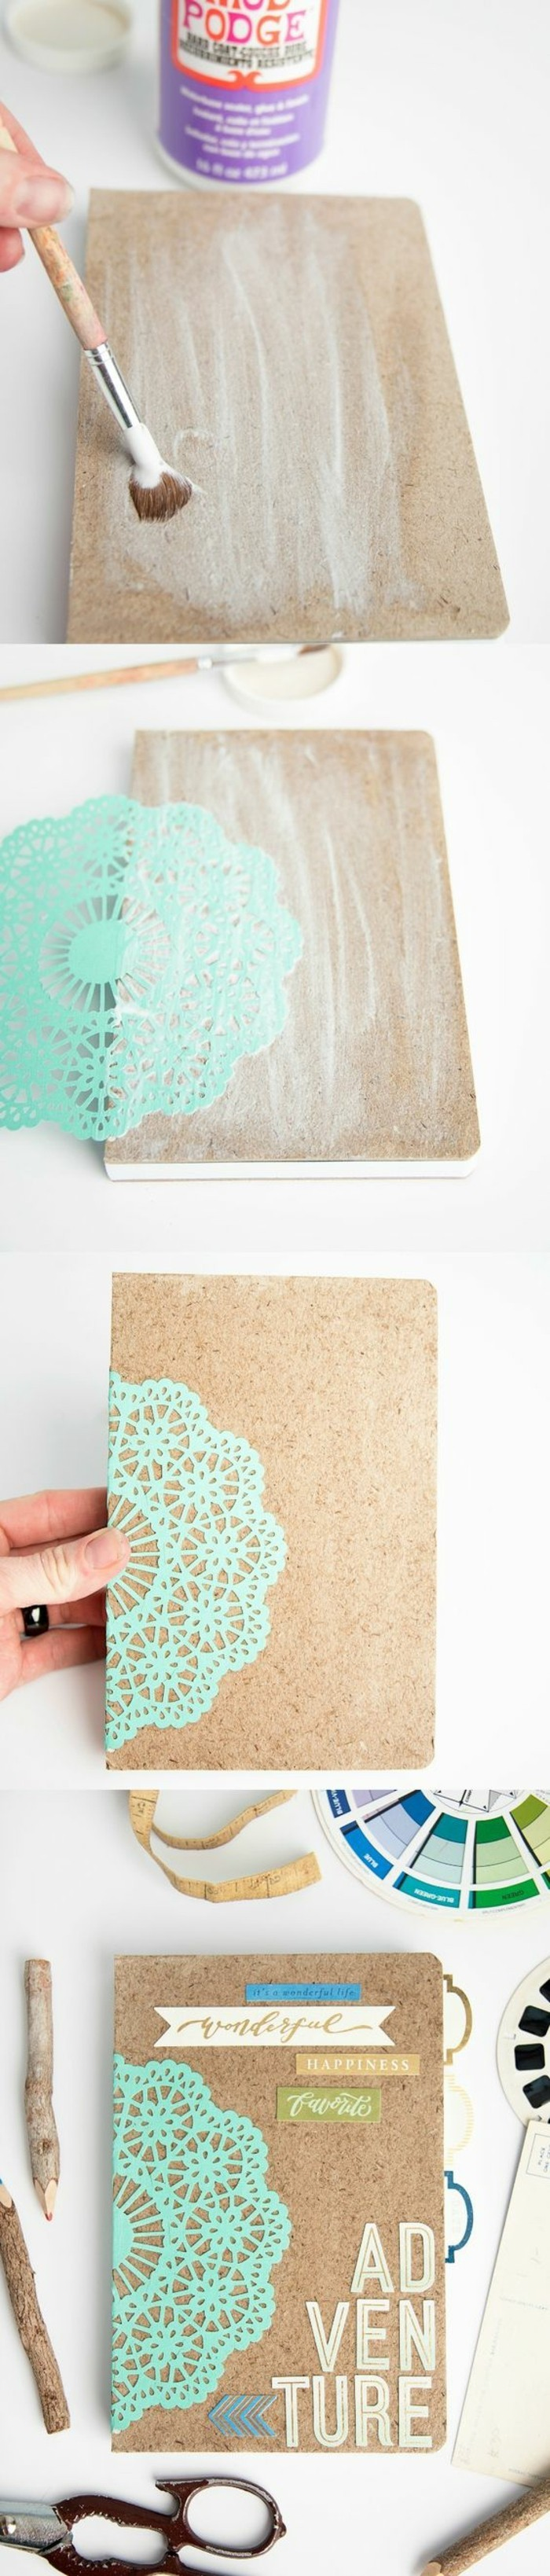 3-kreative-geschenkideen-geburtstageschenkideen-buch-originell-verpacken